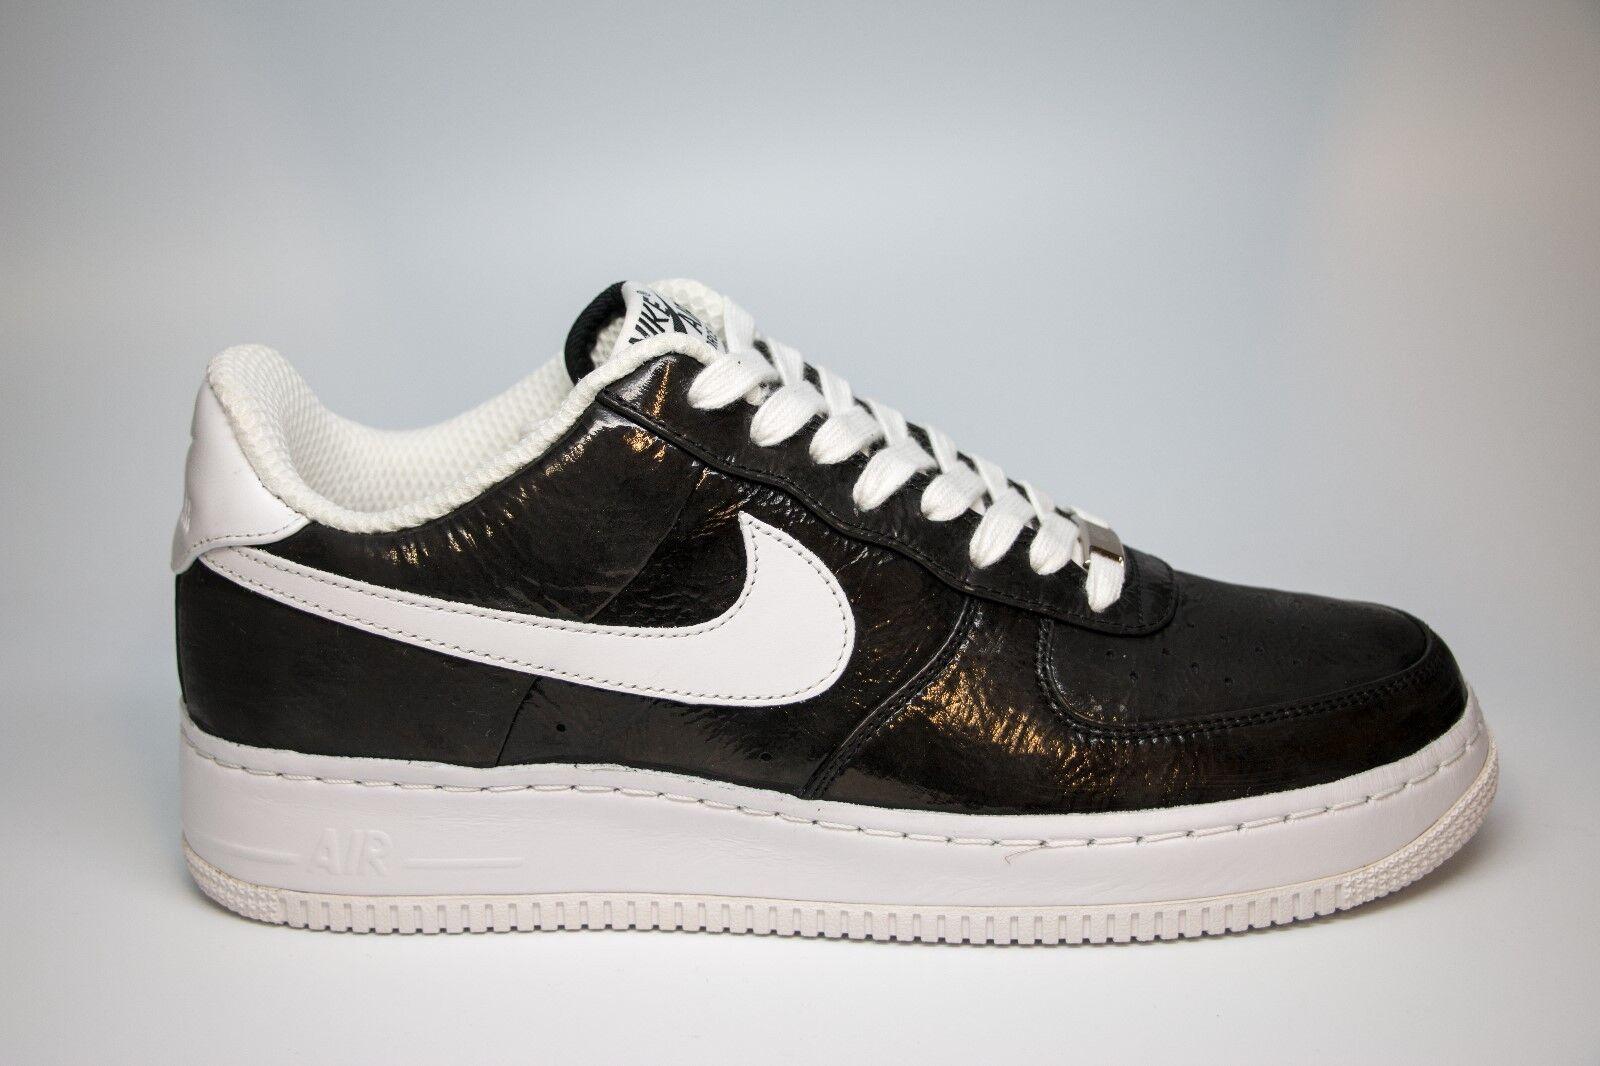 new concept e5475 01de0 NIB Nike Air Force 1 Supreme Slam Jam Jam Jam Black Size 10 Style 318931-